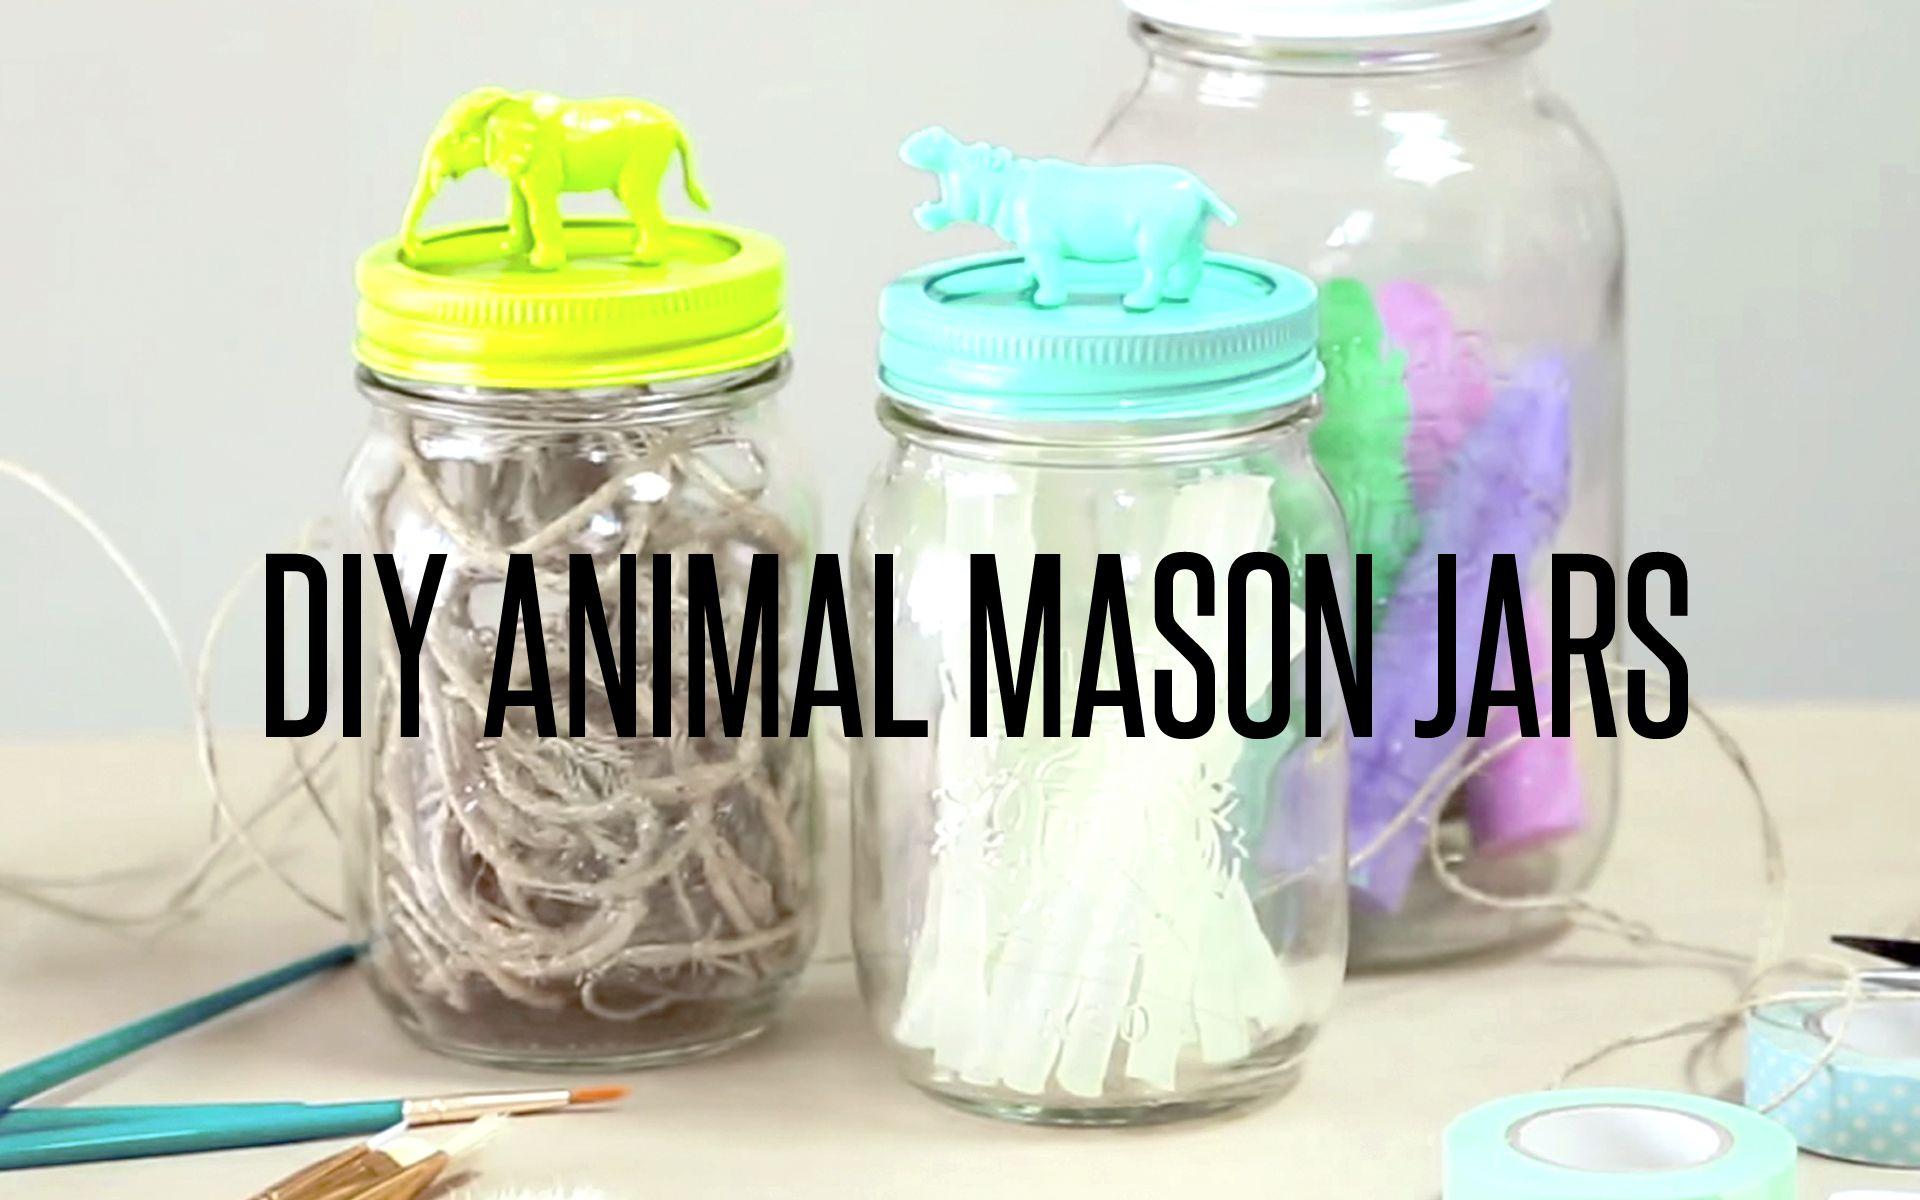 Mason Jar Room Decor Diy Animal Lid Mason Jars  Interior Decor  Tsg  Pinterest